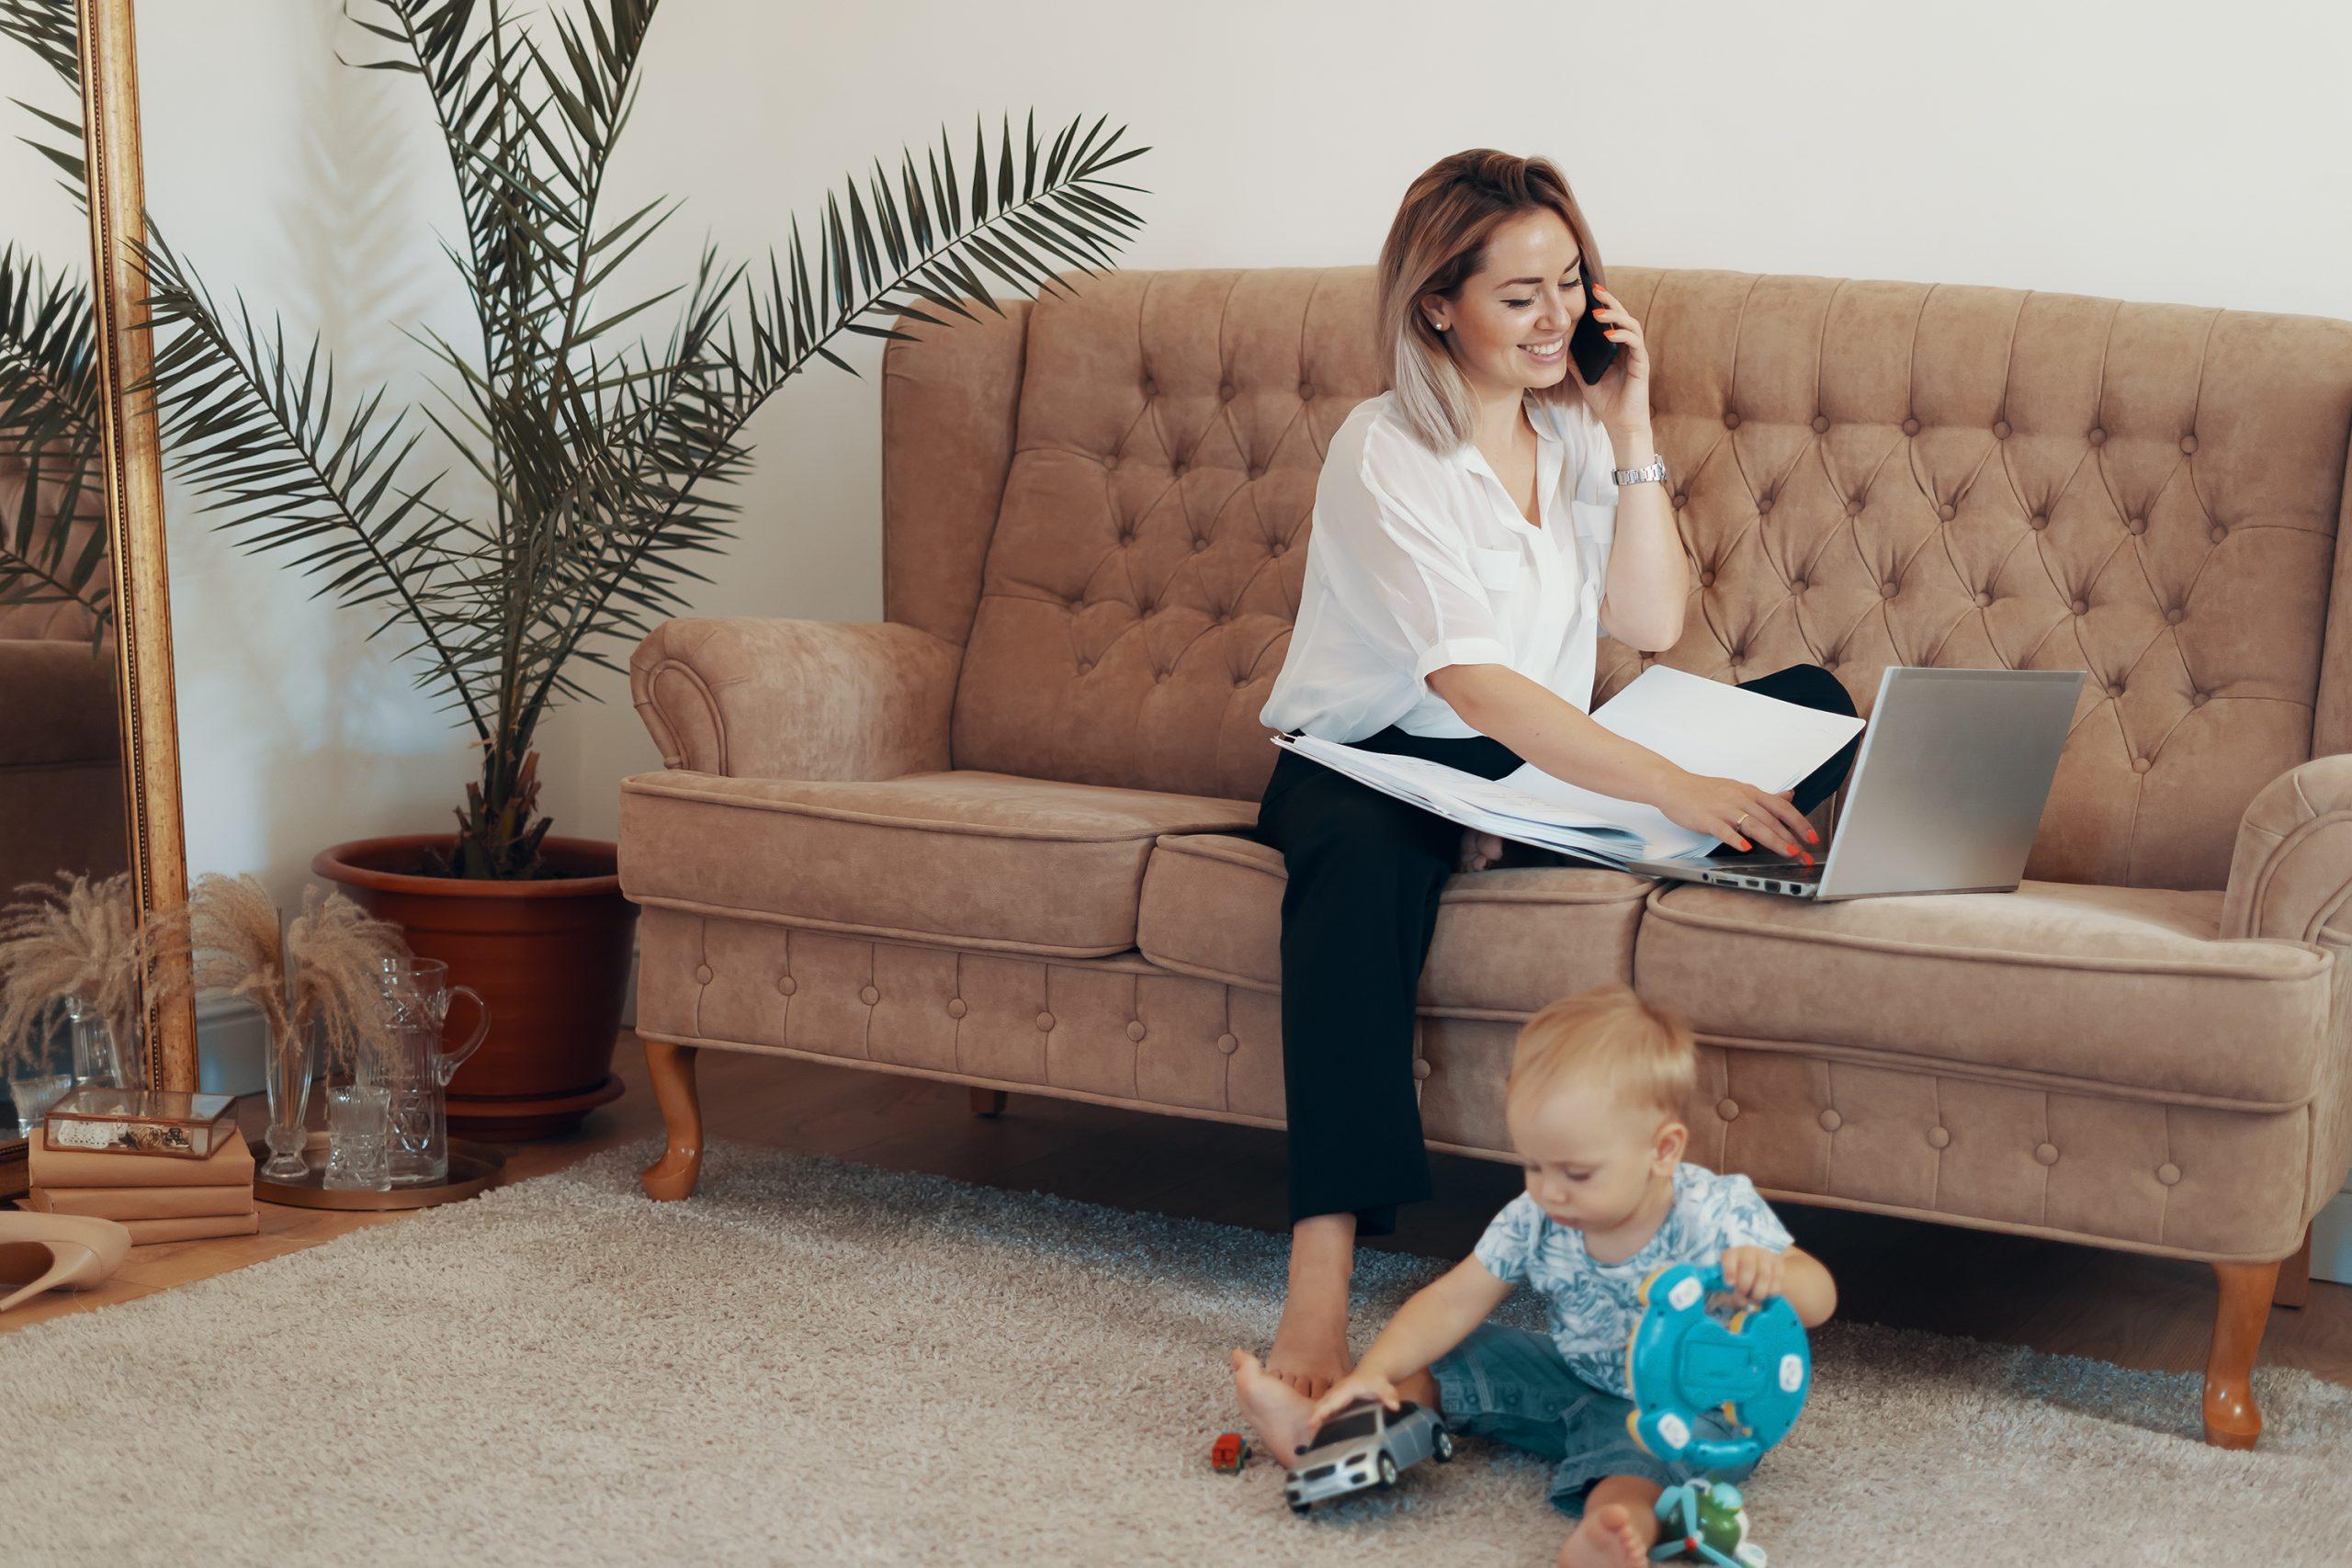 CONGEDO PER GENITORI E BONUS BABY-SITTING